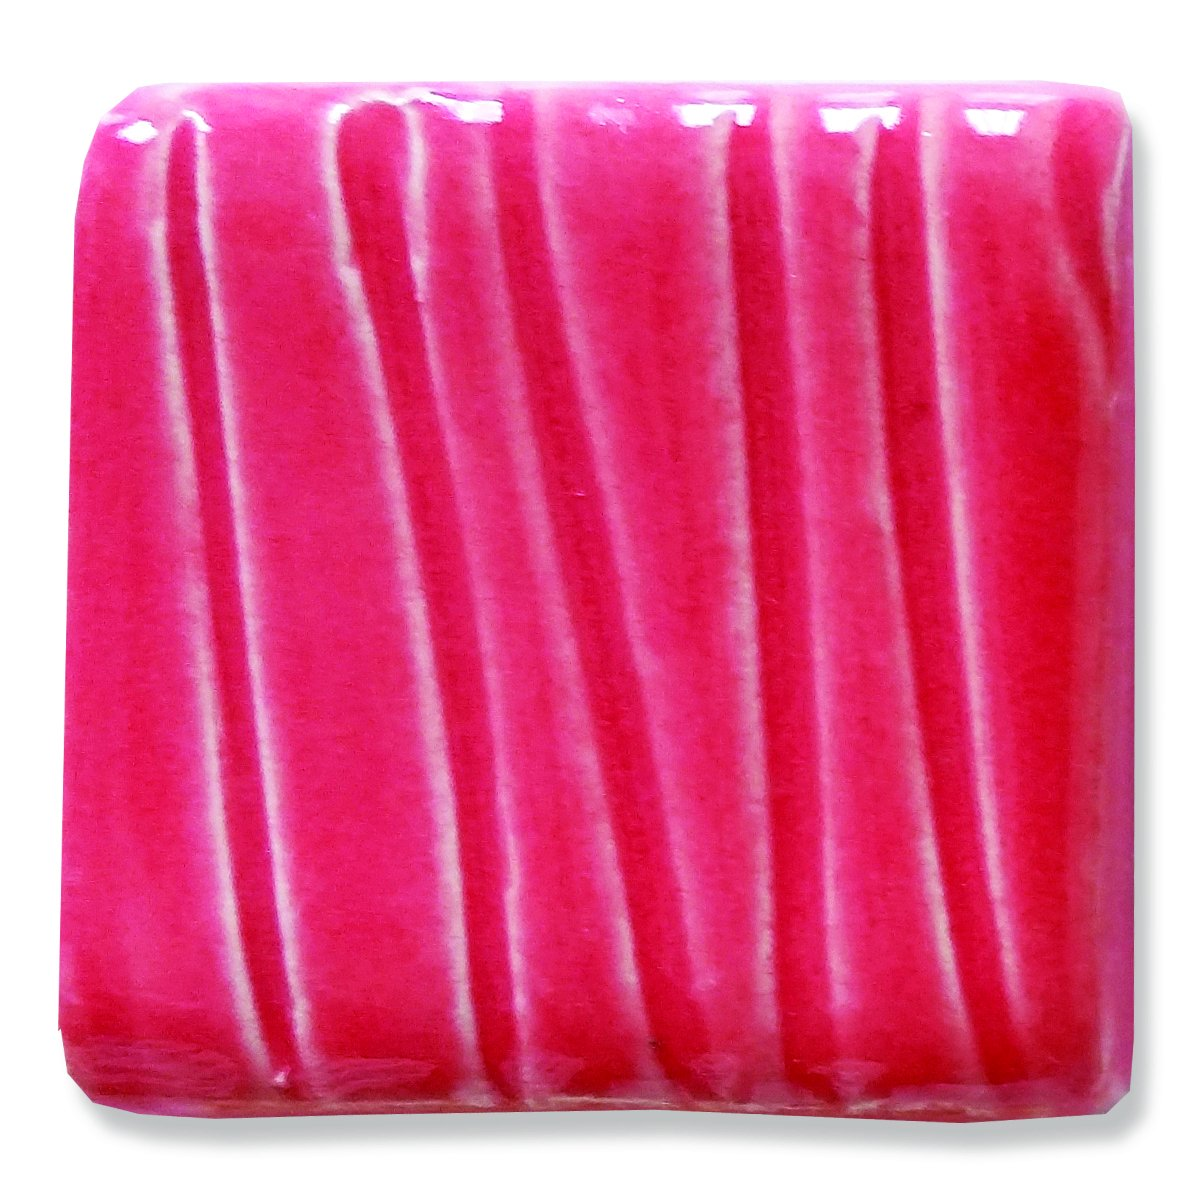 Orange Speedball 004022 Earthenware Glaze 16 oz